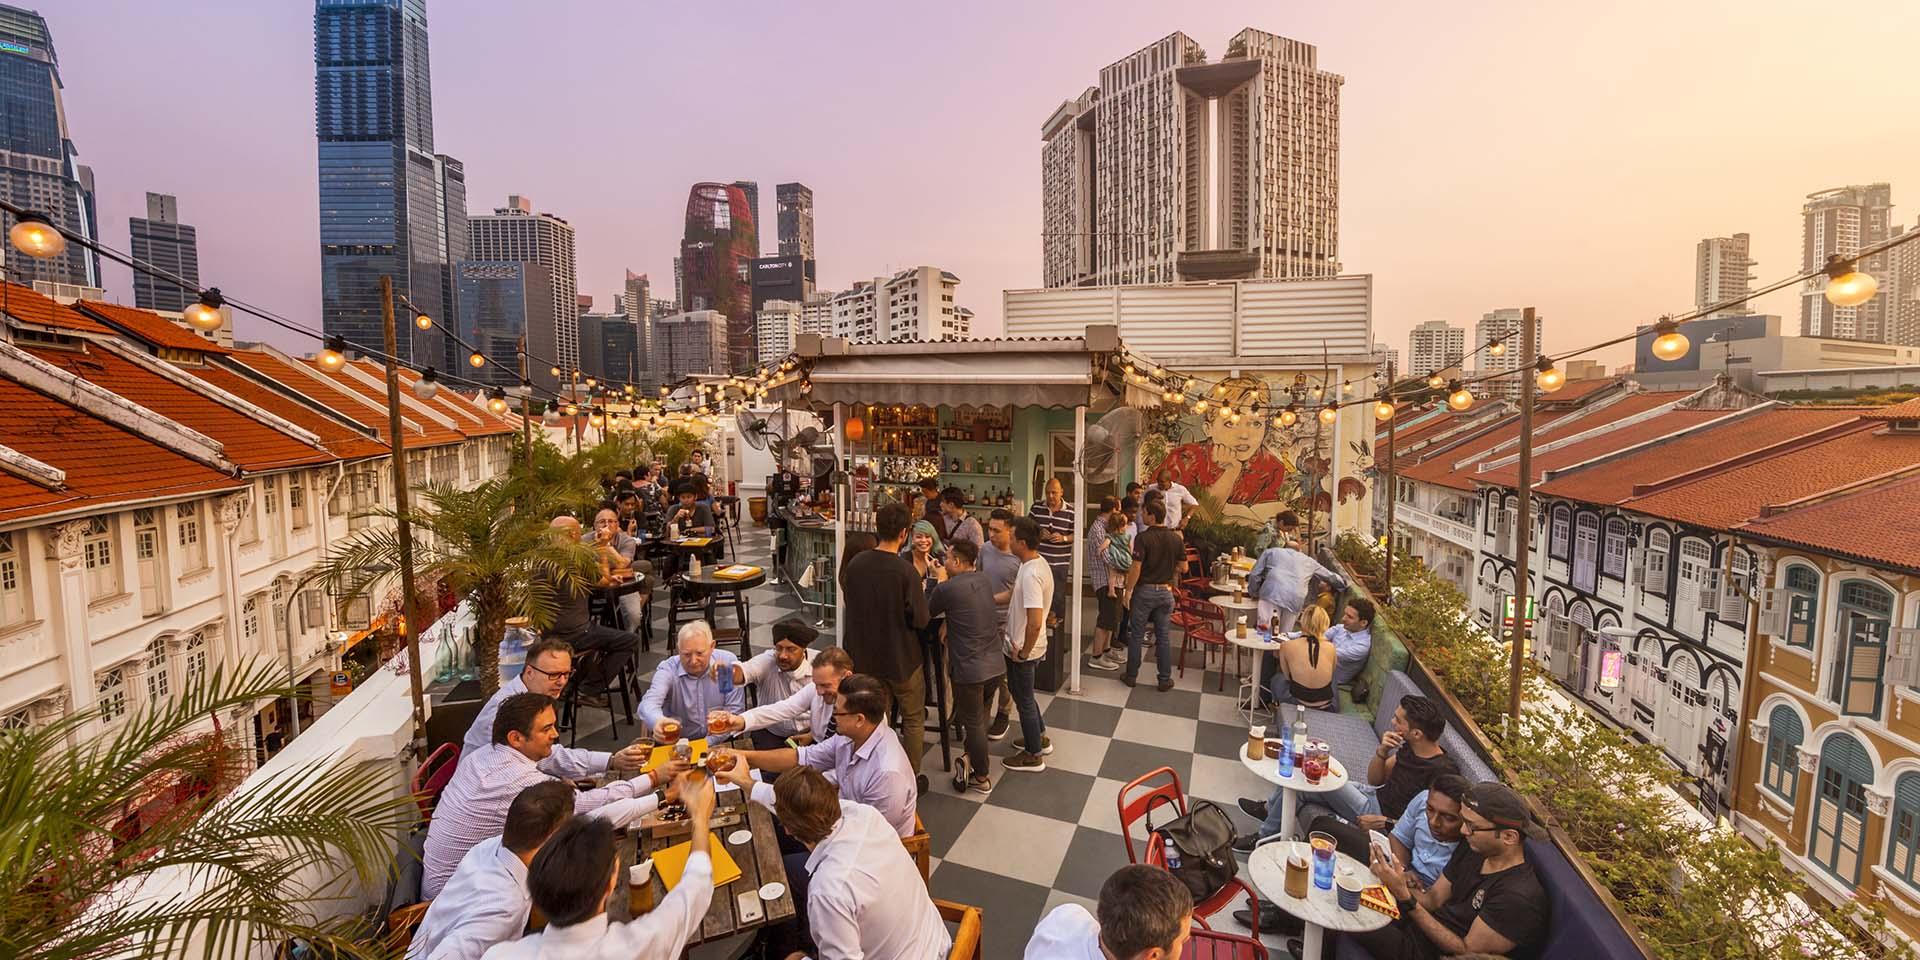 5 Unbeatable Nightlife Hotspots in Singapore